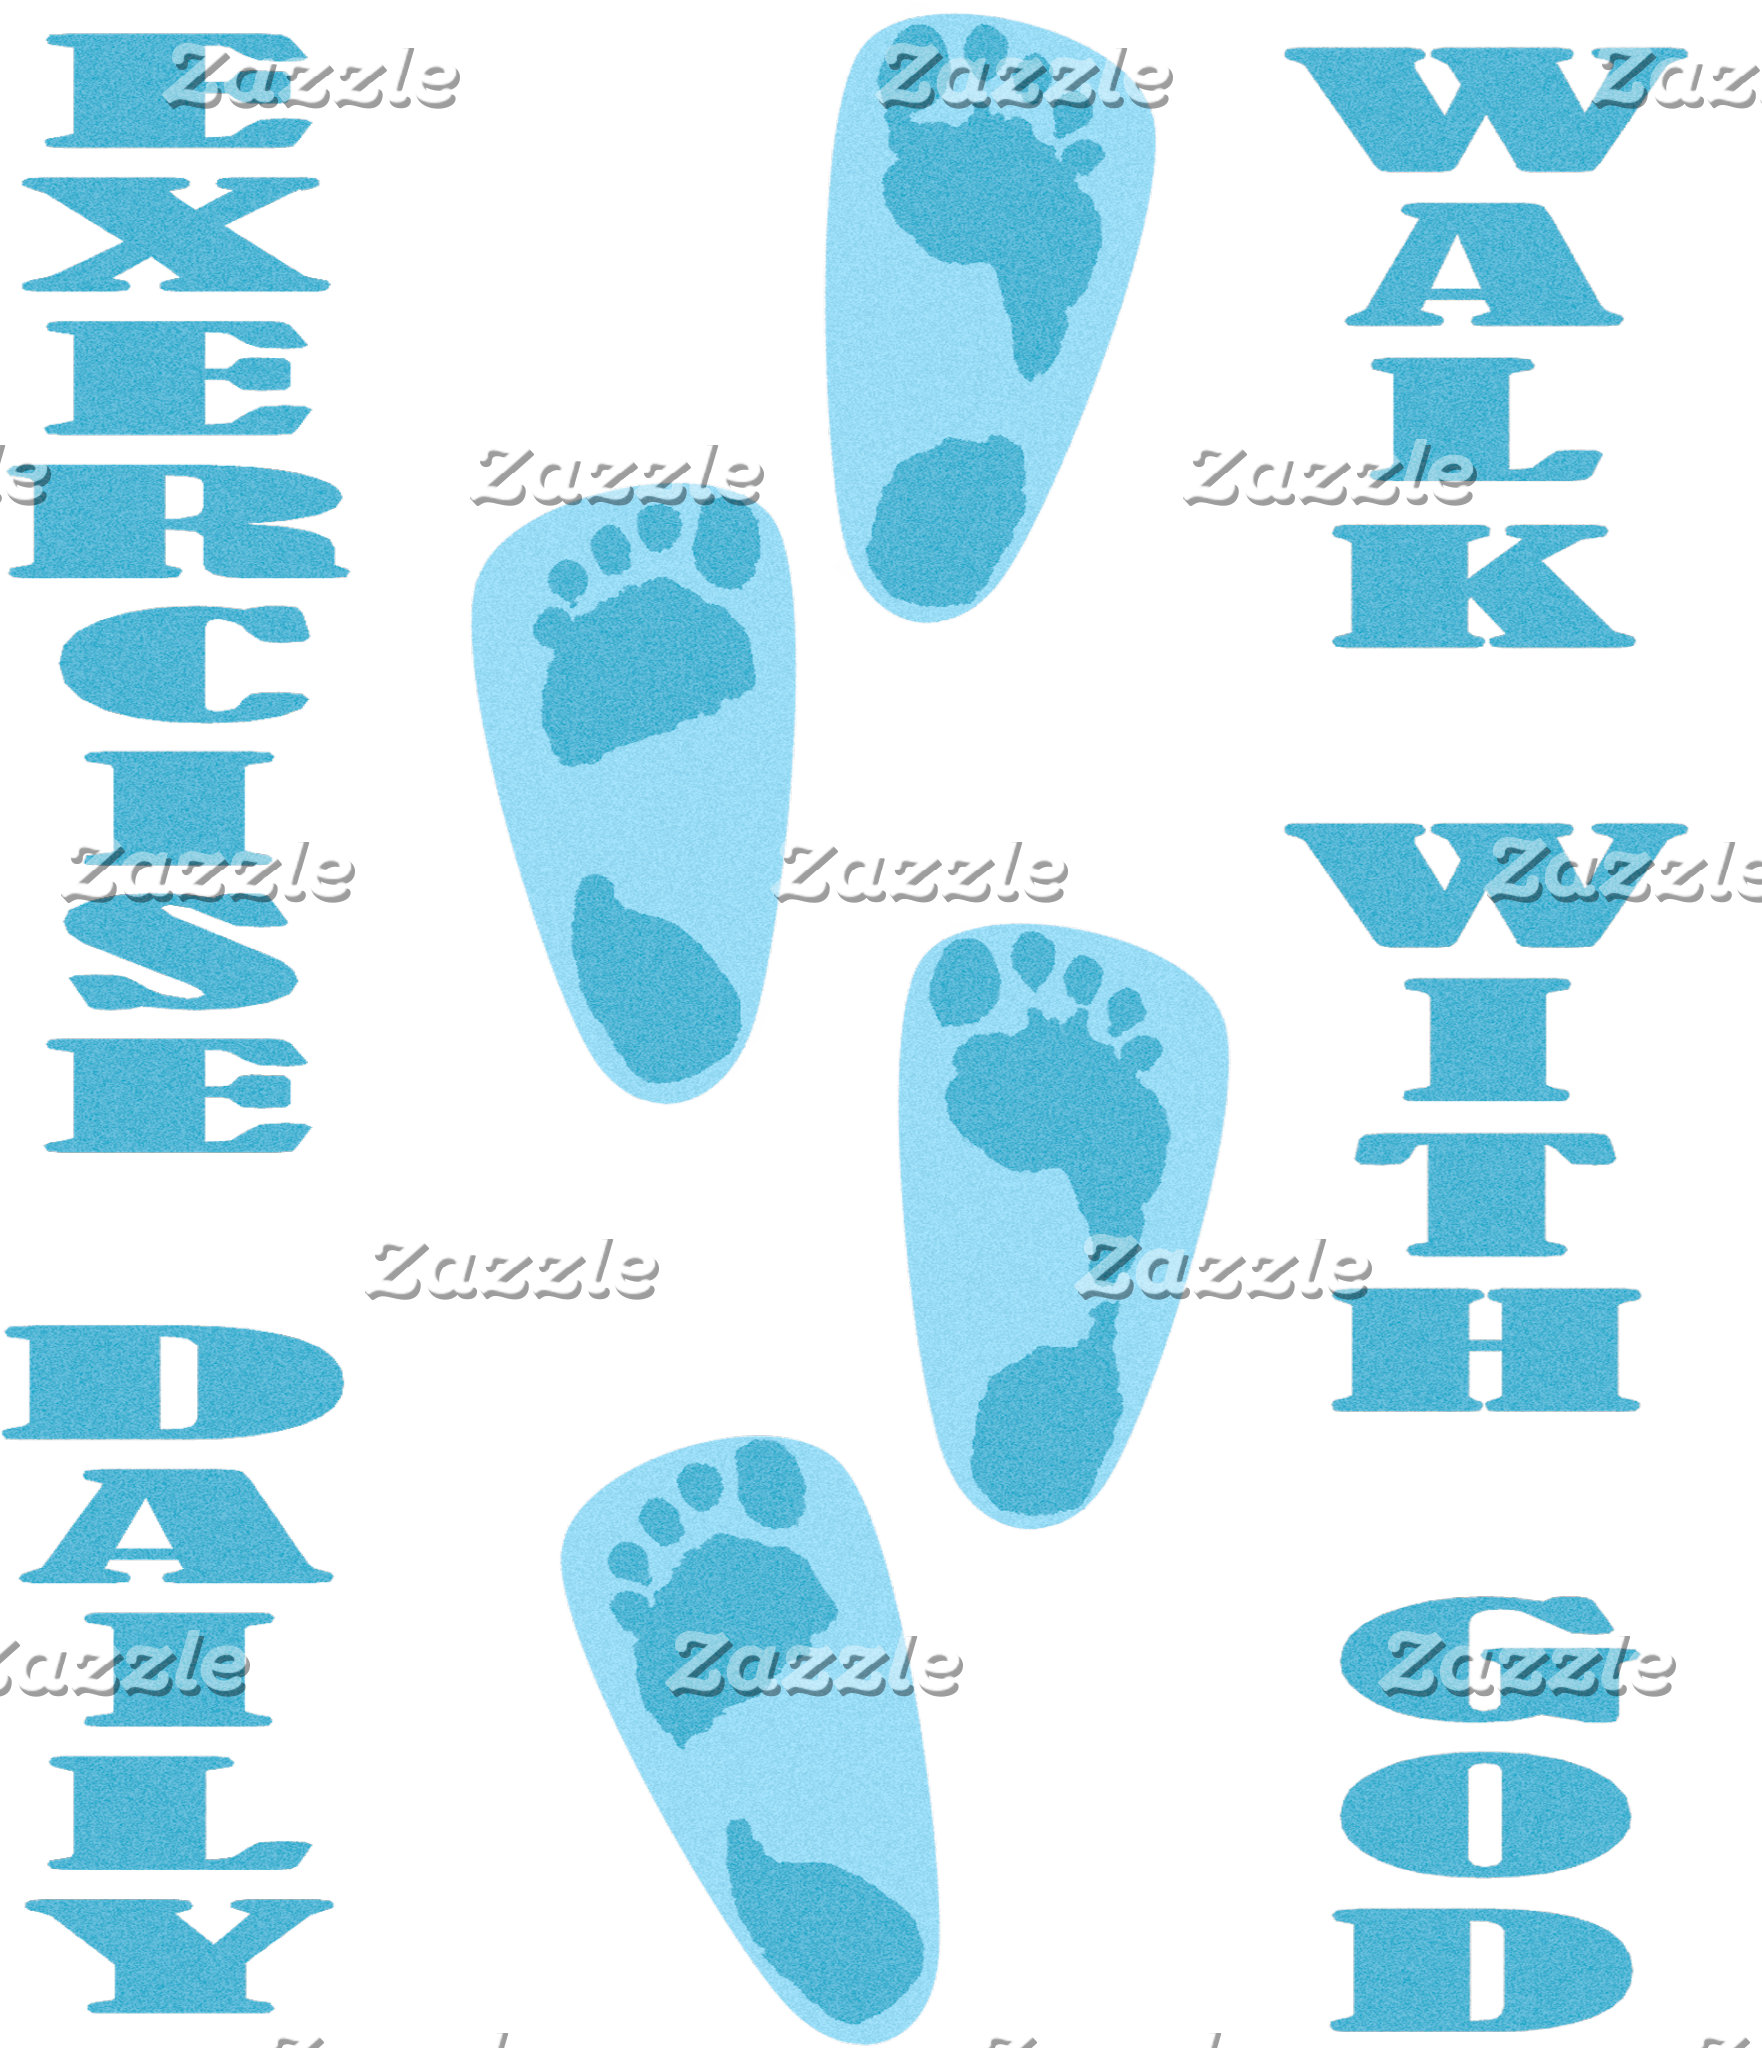 Exercise Daily - Walk with God (Matt 11:28-30)